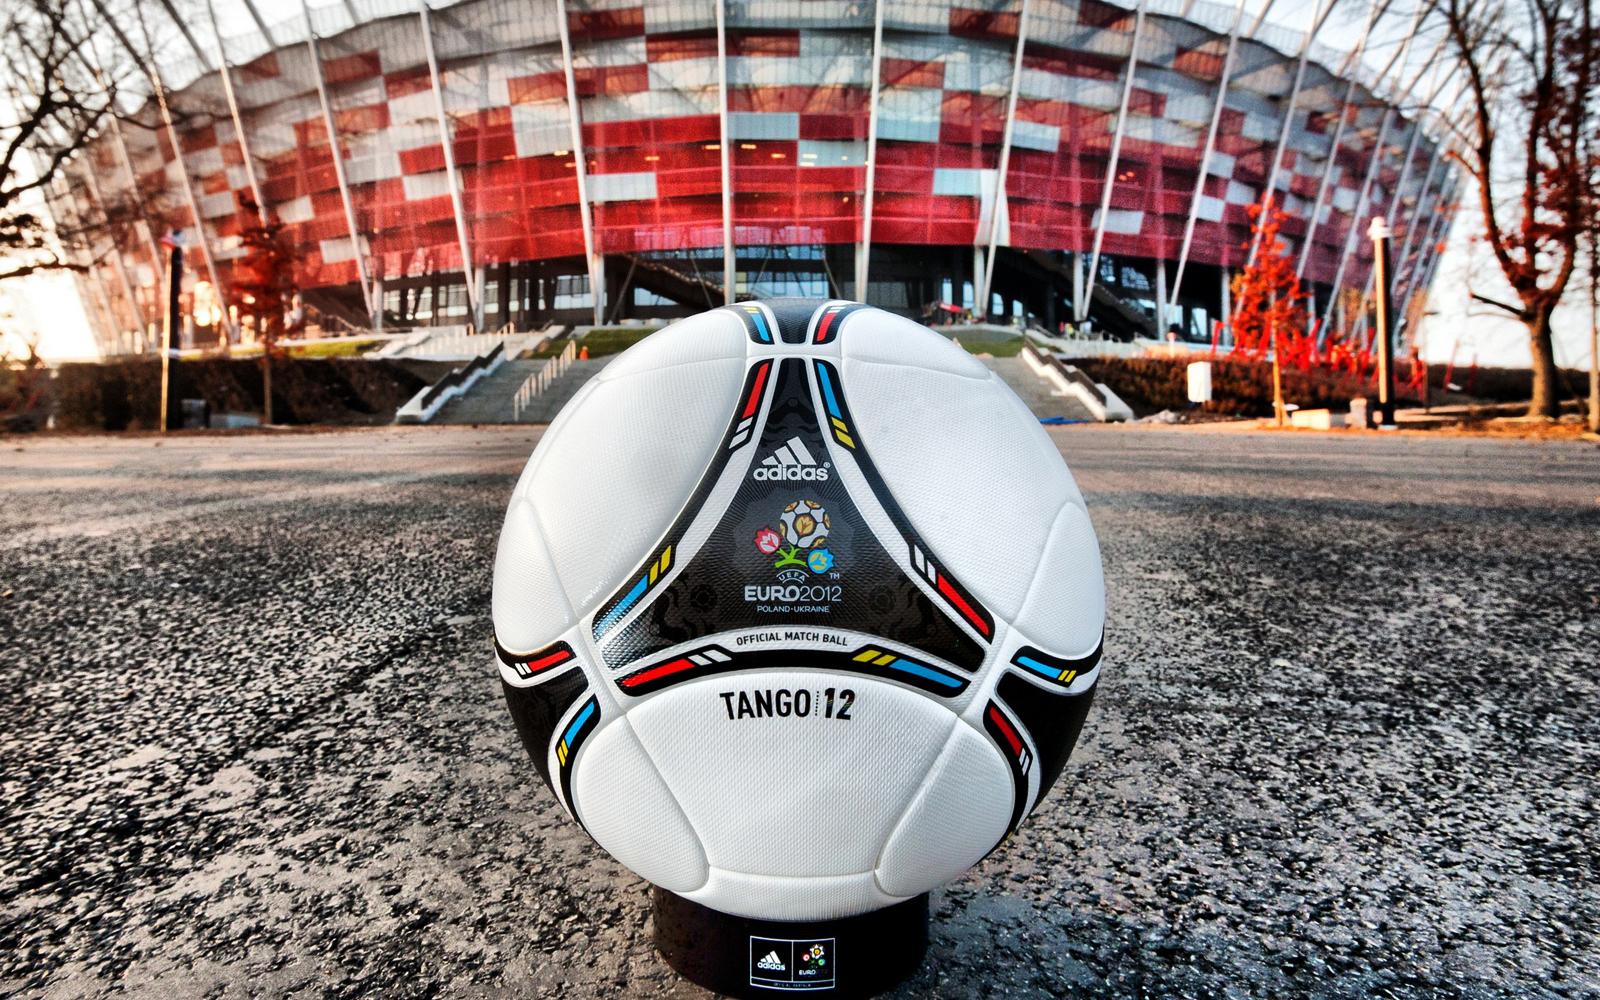 http://3.bp.blogspot.com/-leUVoe-cuUU/T8oPXYSxVsI/AAAAAAAAANw/yZ1UzaB9hNw/s1600/Euro_2012_Cup_Adidas_Tango_Ball_Warsaw_Stadium_HD_Wallpaper-Vvallpaper.Net.jpg